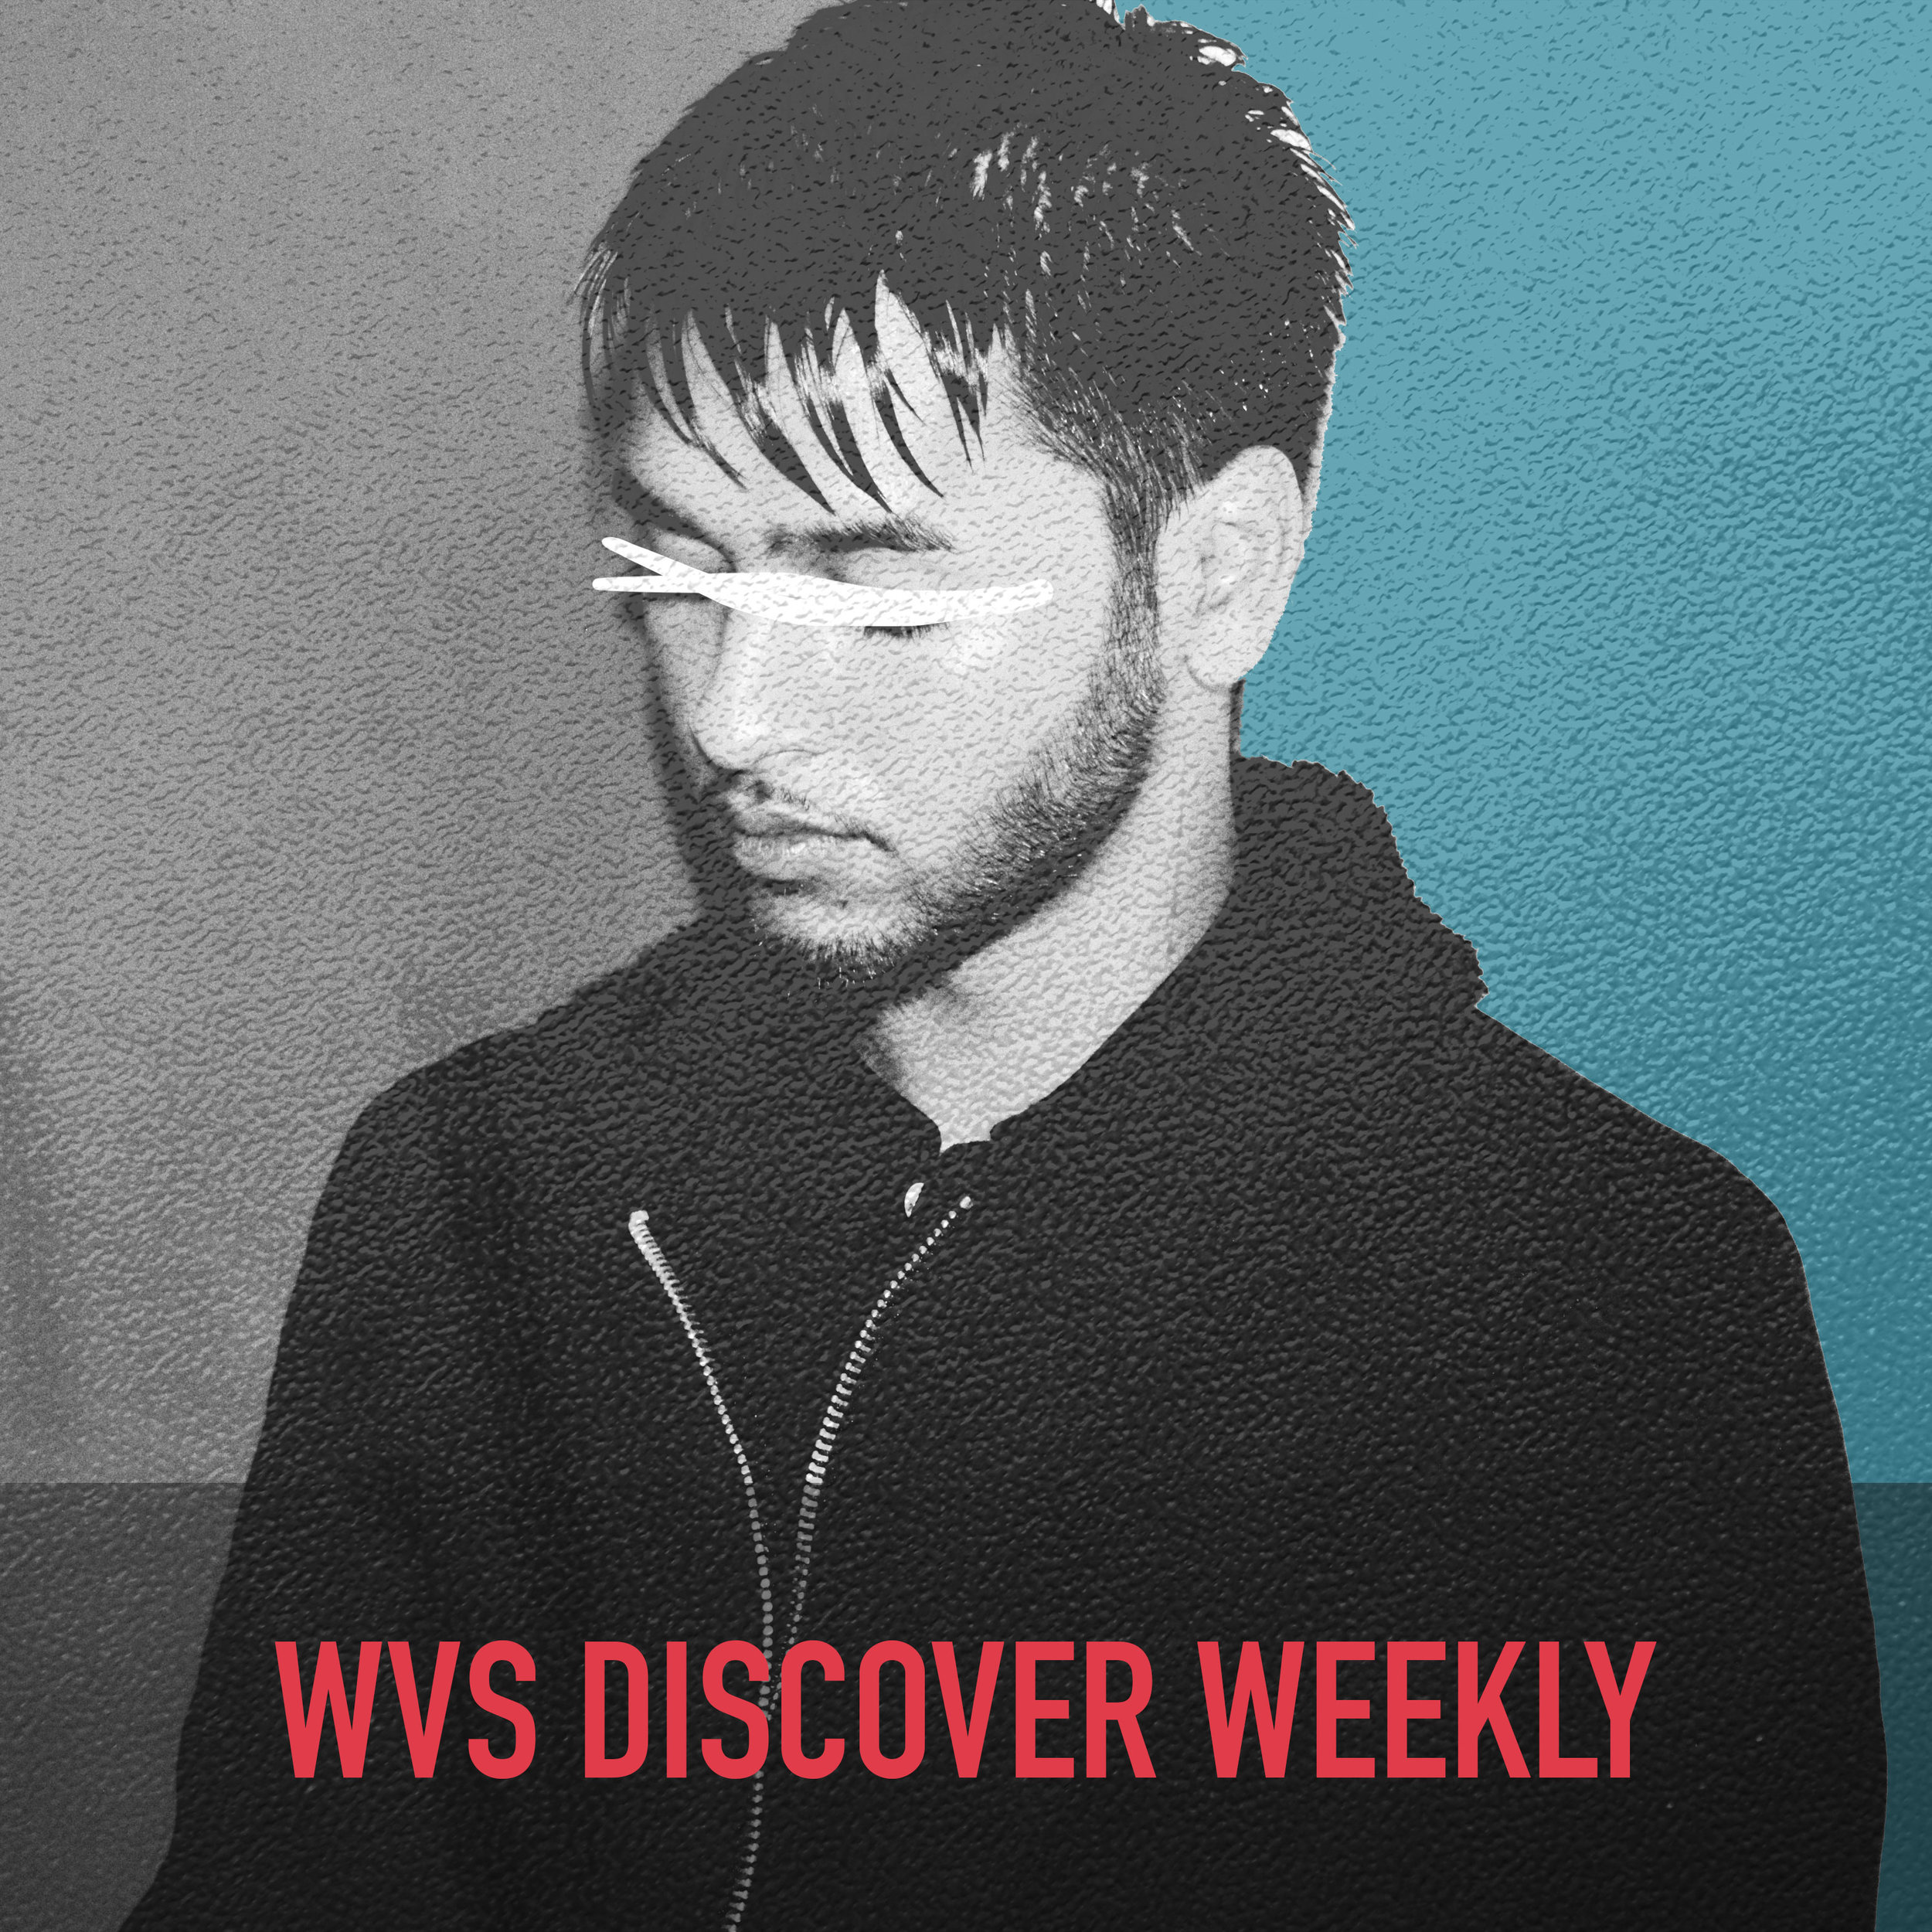 vicwvsdiscoverweekly2.jpg